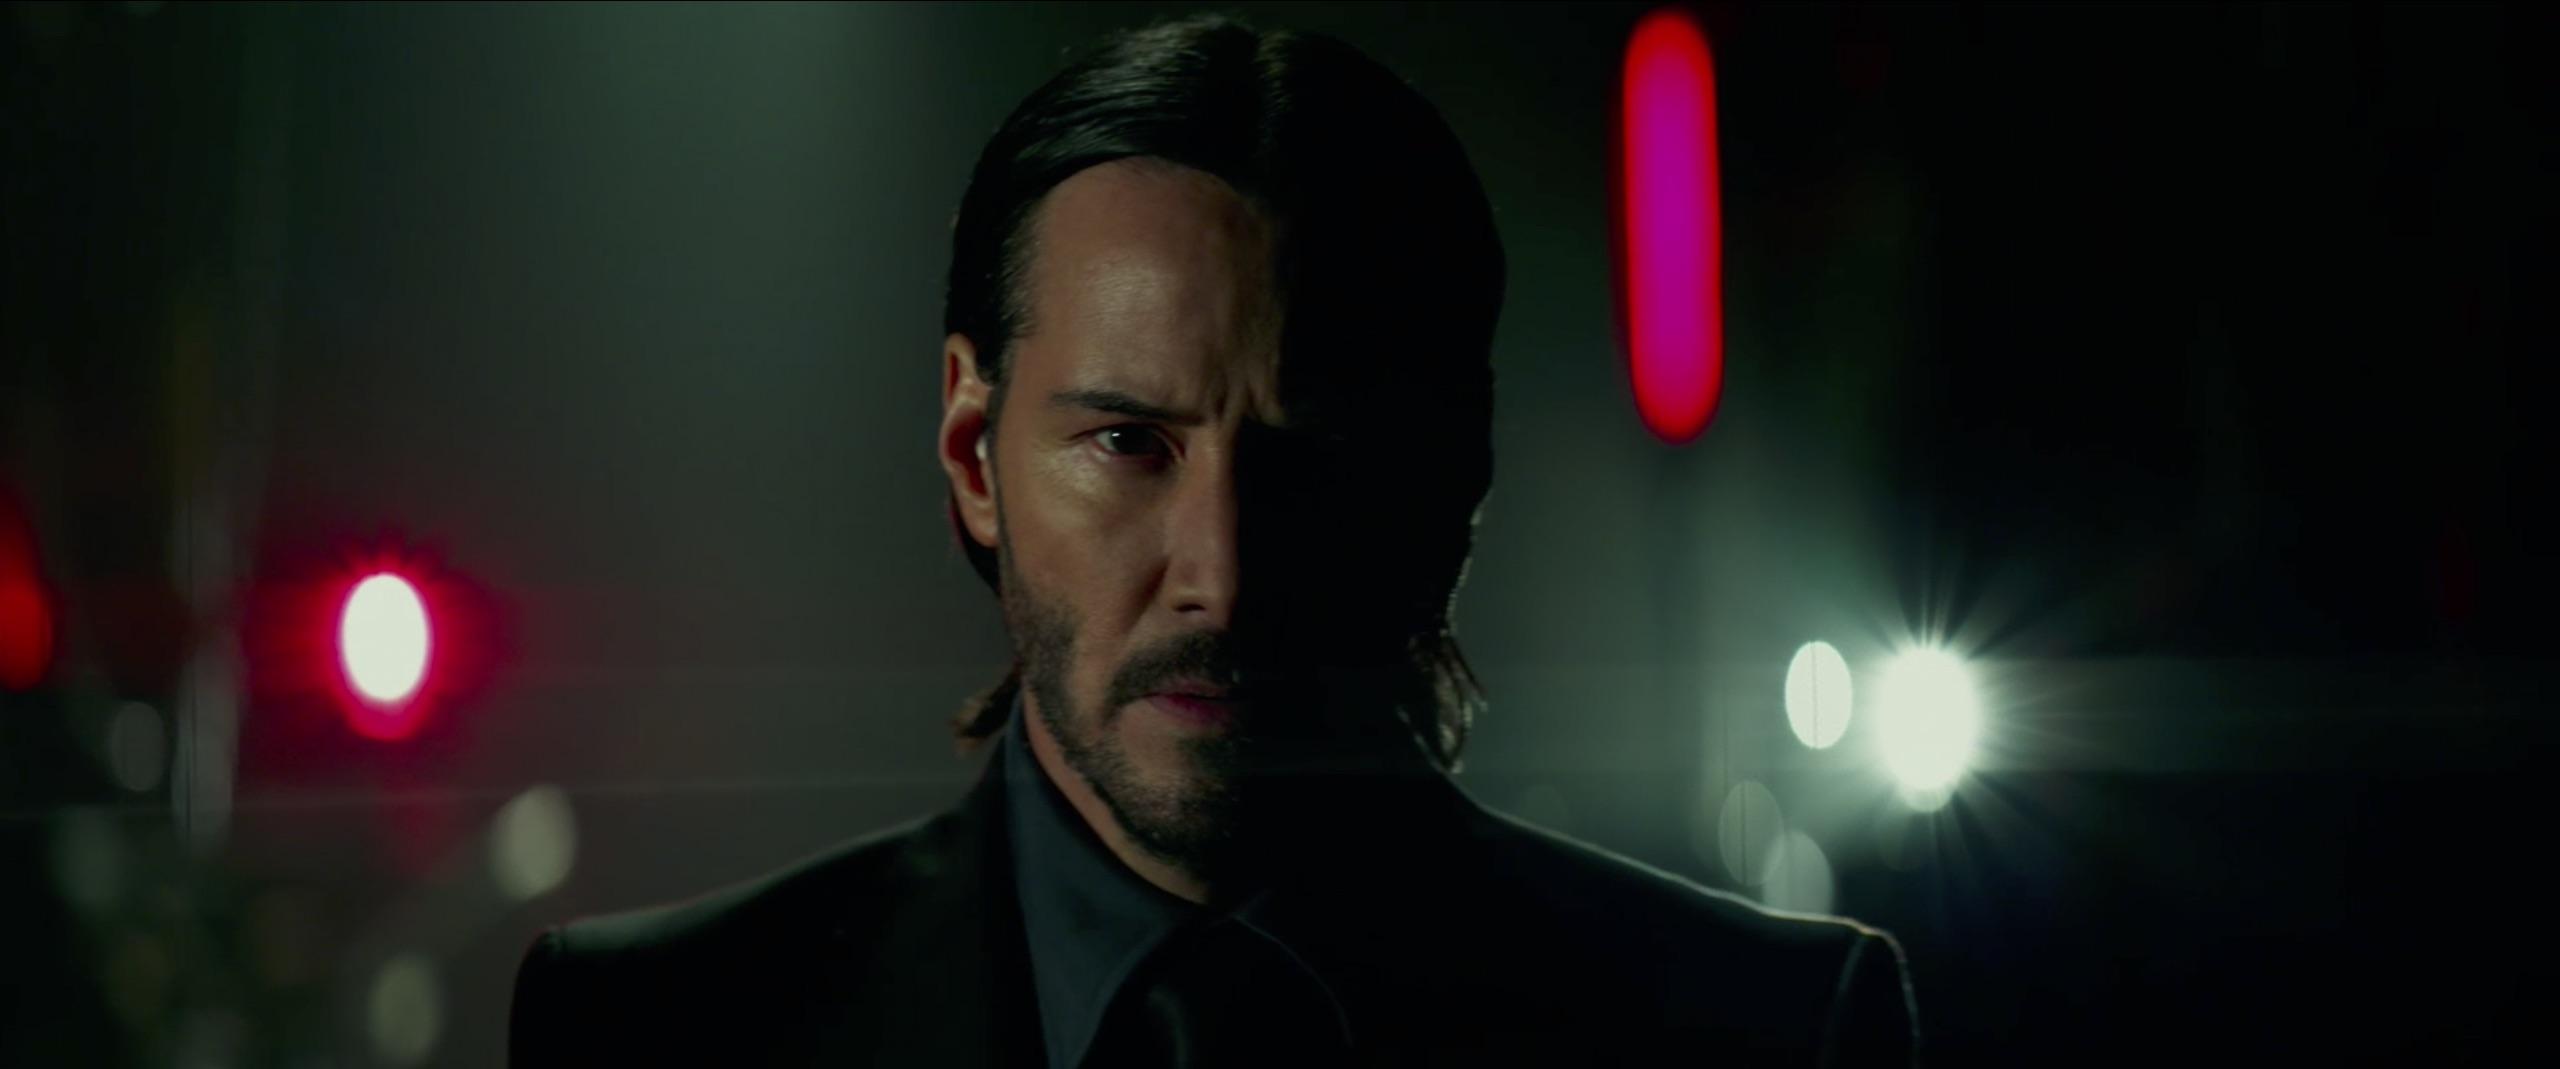 Keanu Reeves John Wick: Chapter 2